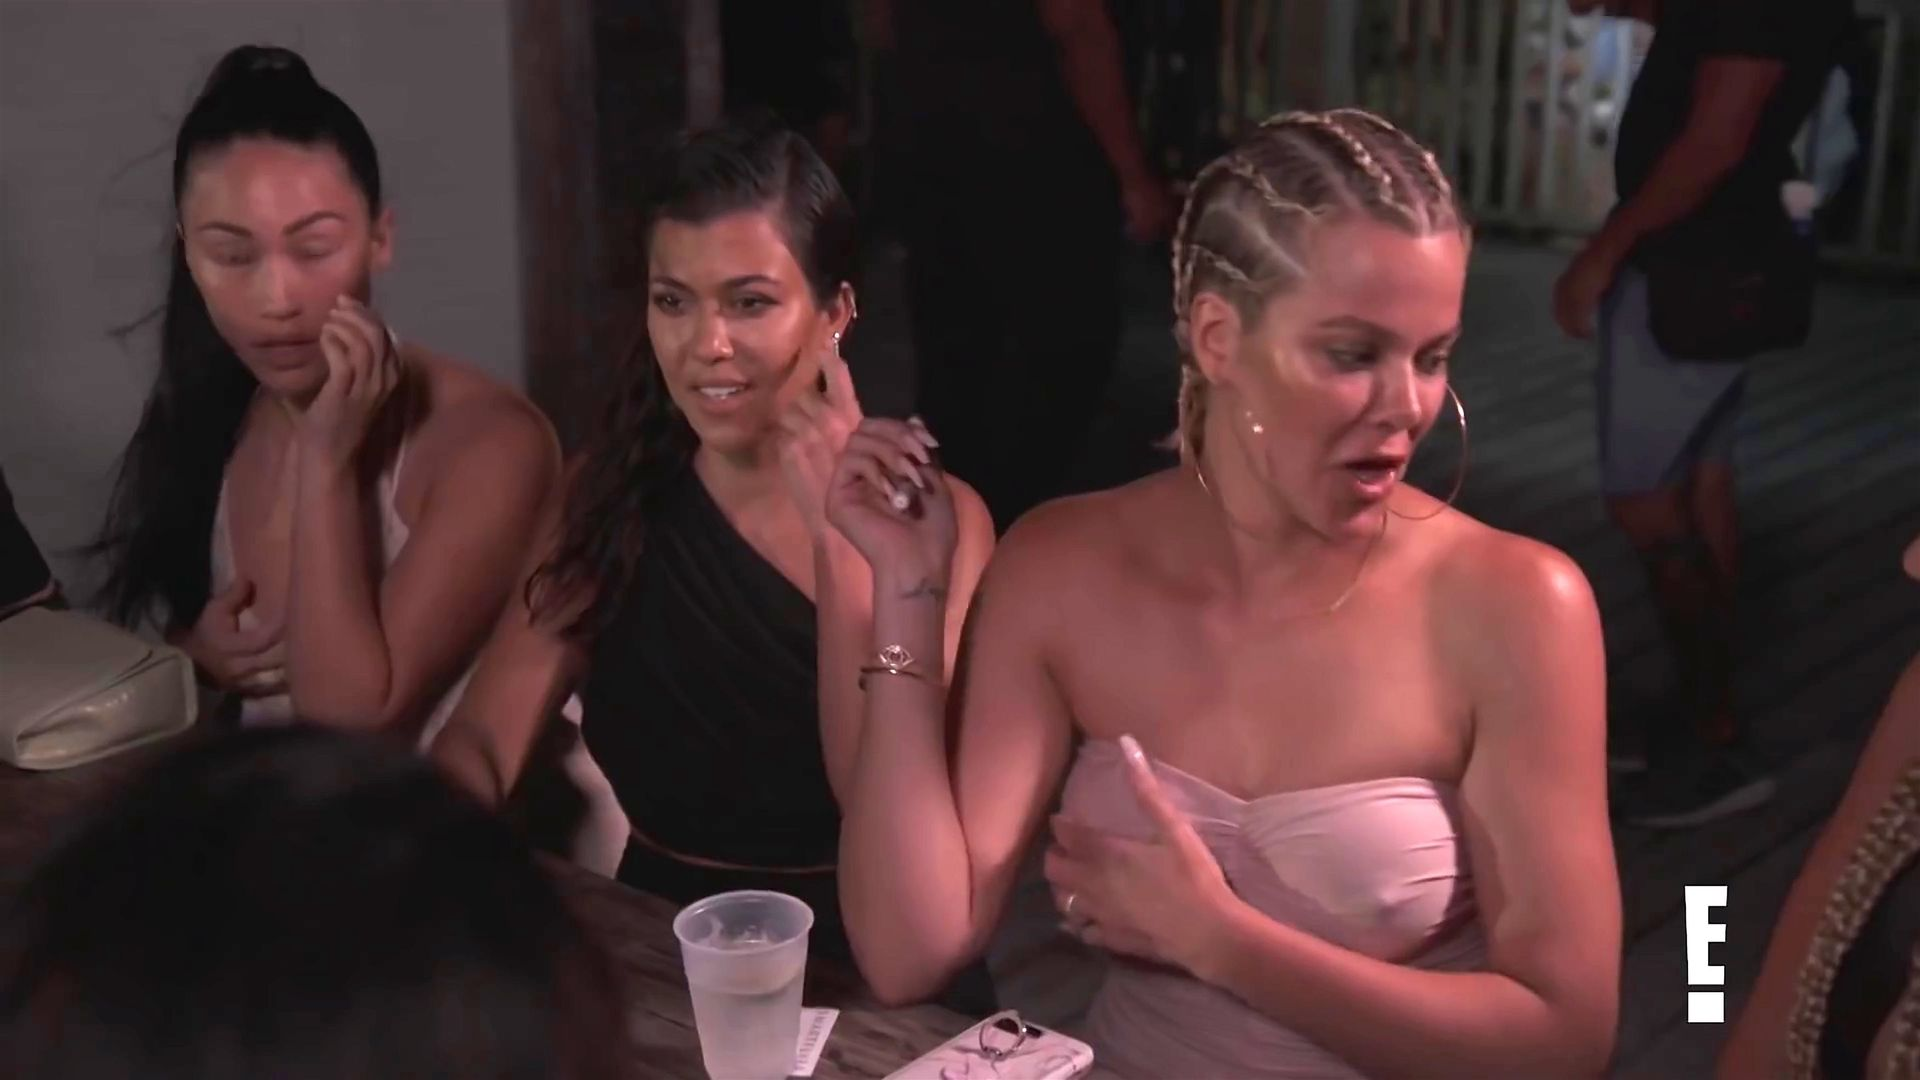 Khloé Kardashian Gets A Little Cold Without A Bra 0002